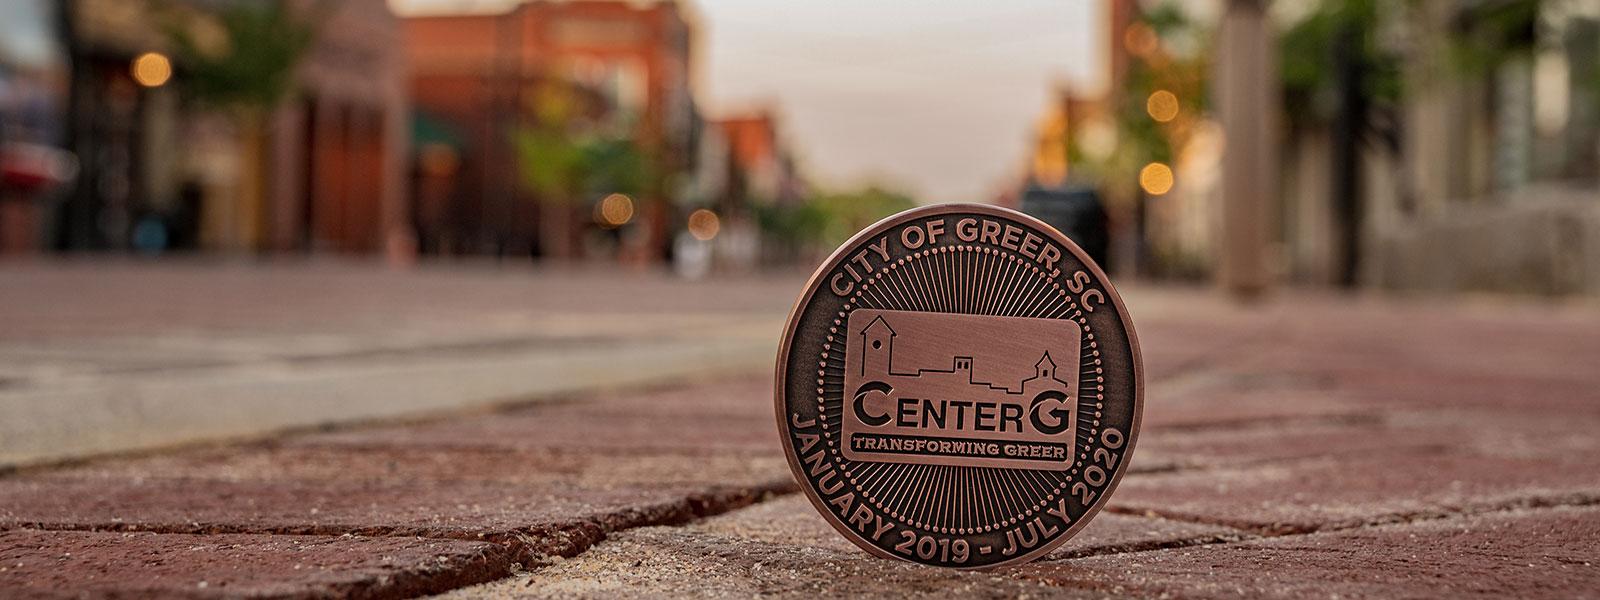 CenterG Communications Efforts Earn City of Greer 2020 Achievement Award